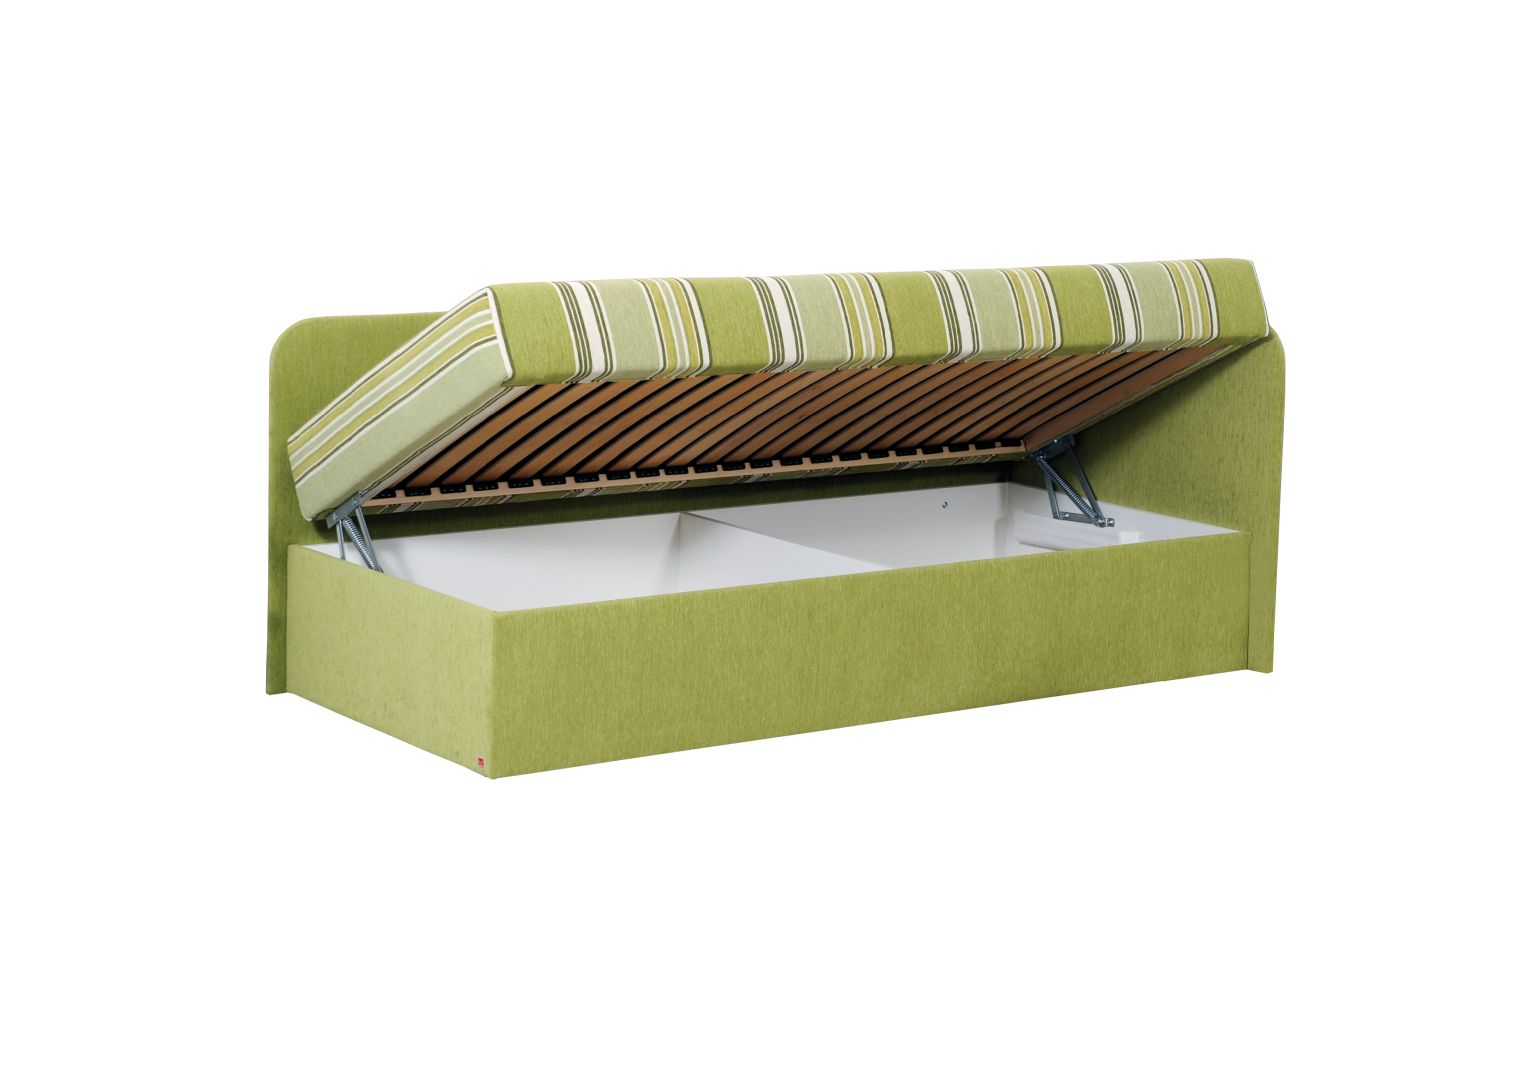 APOLÓN jednolůžková postel s úložným prostorem